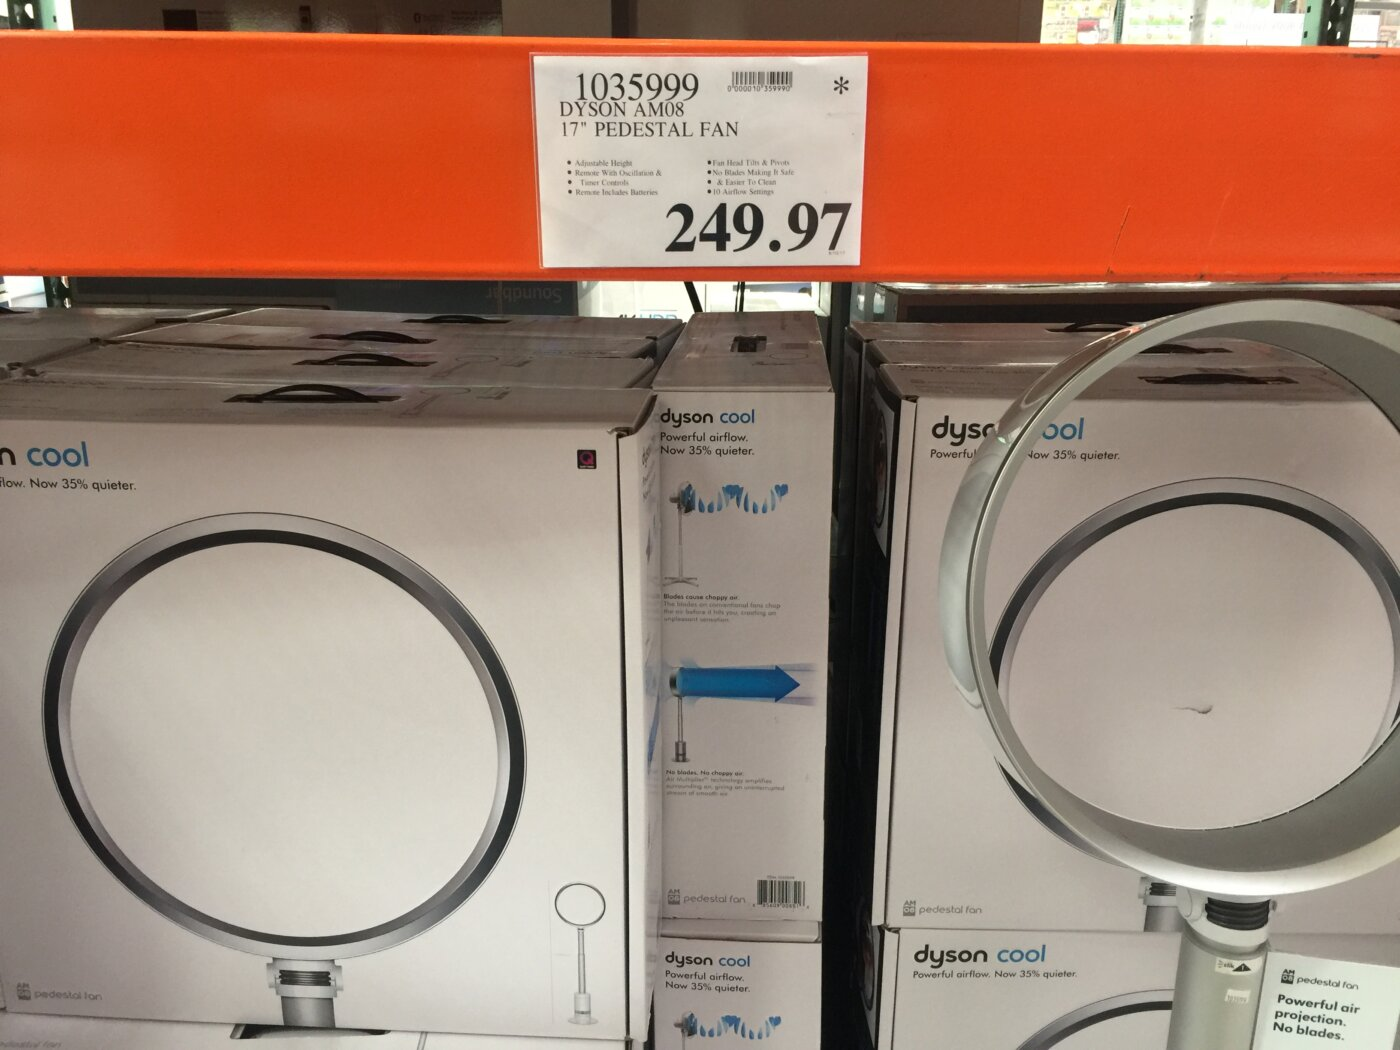 clean white whitesilver heating silver appliances fan fans dyson pedestal small